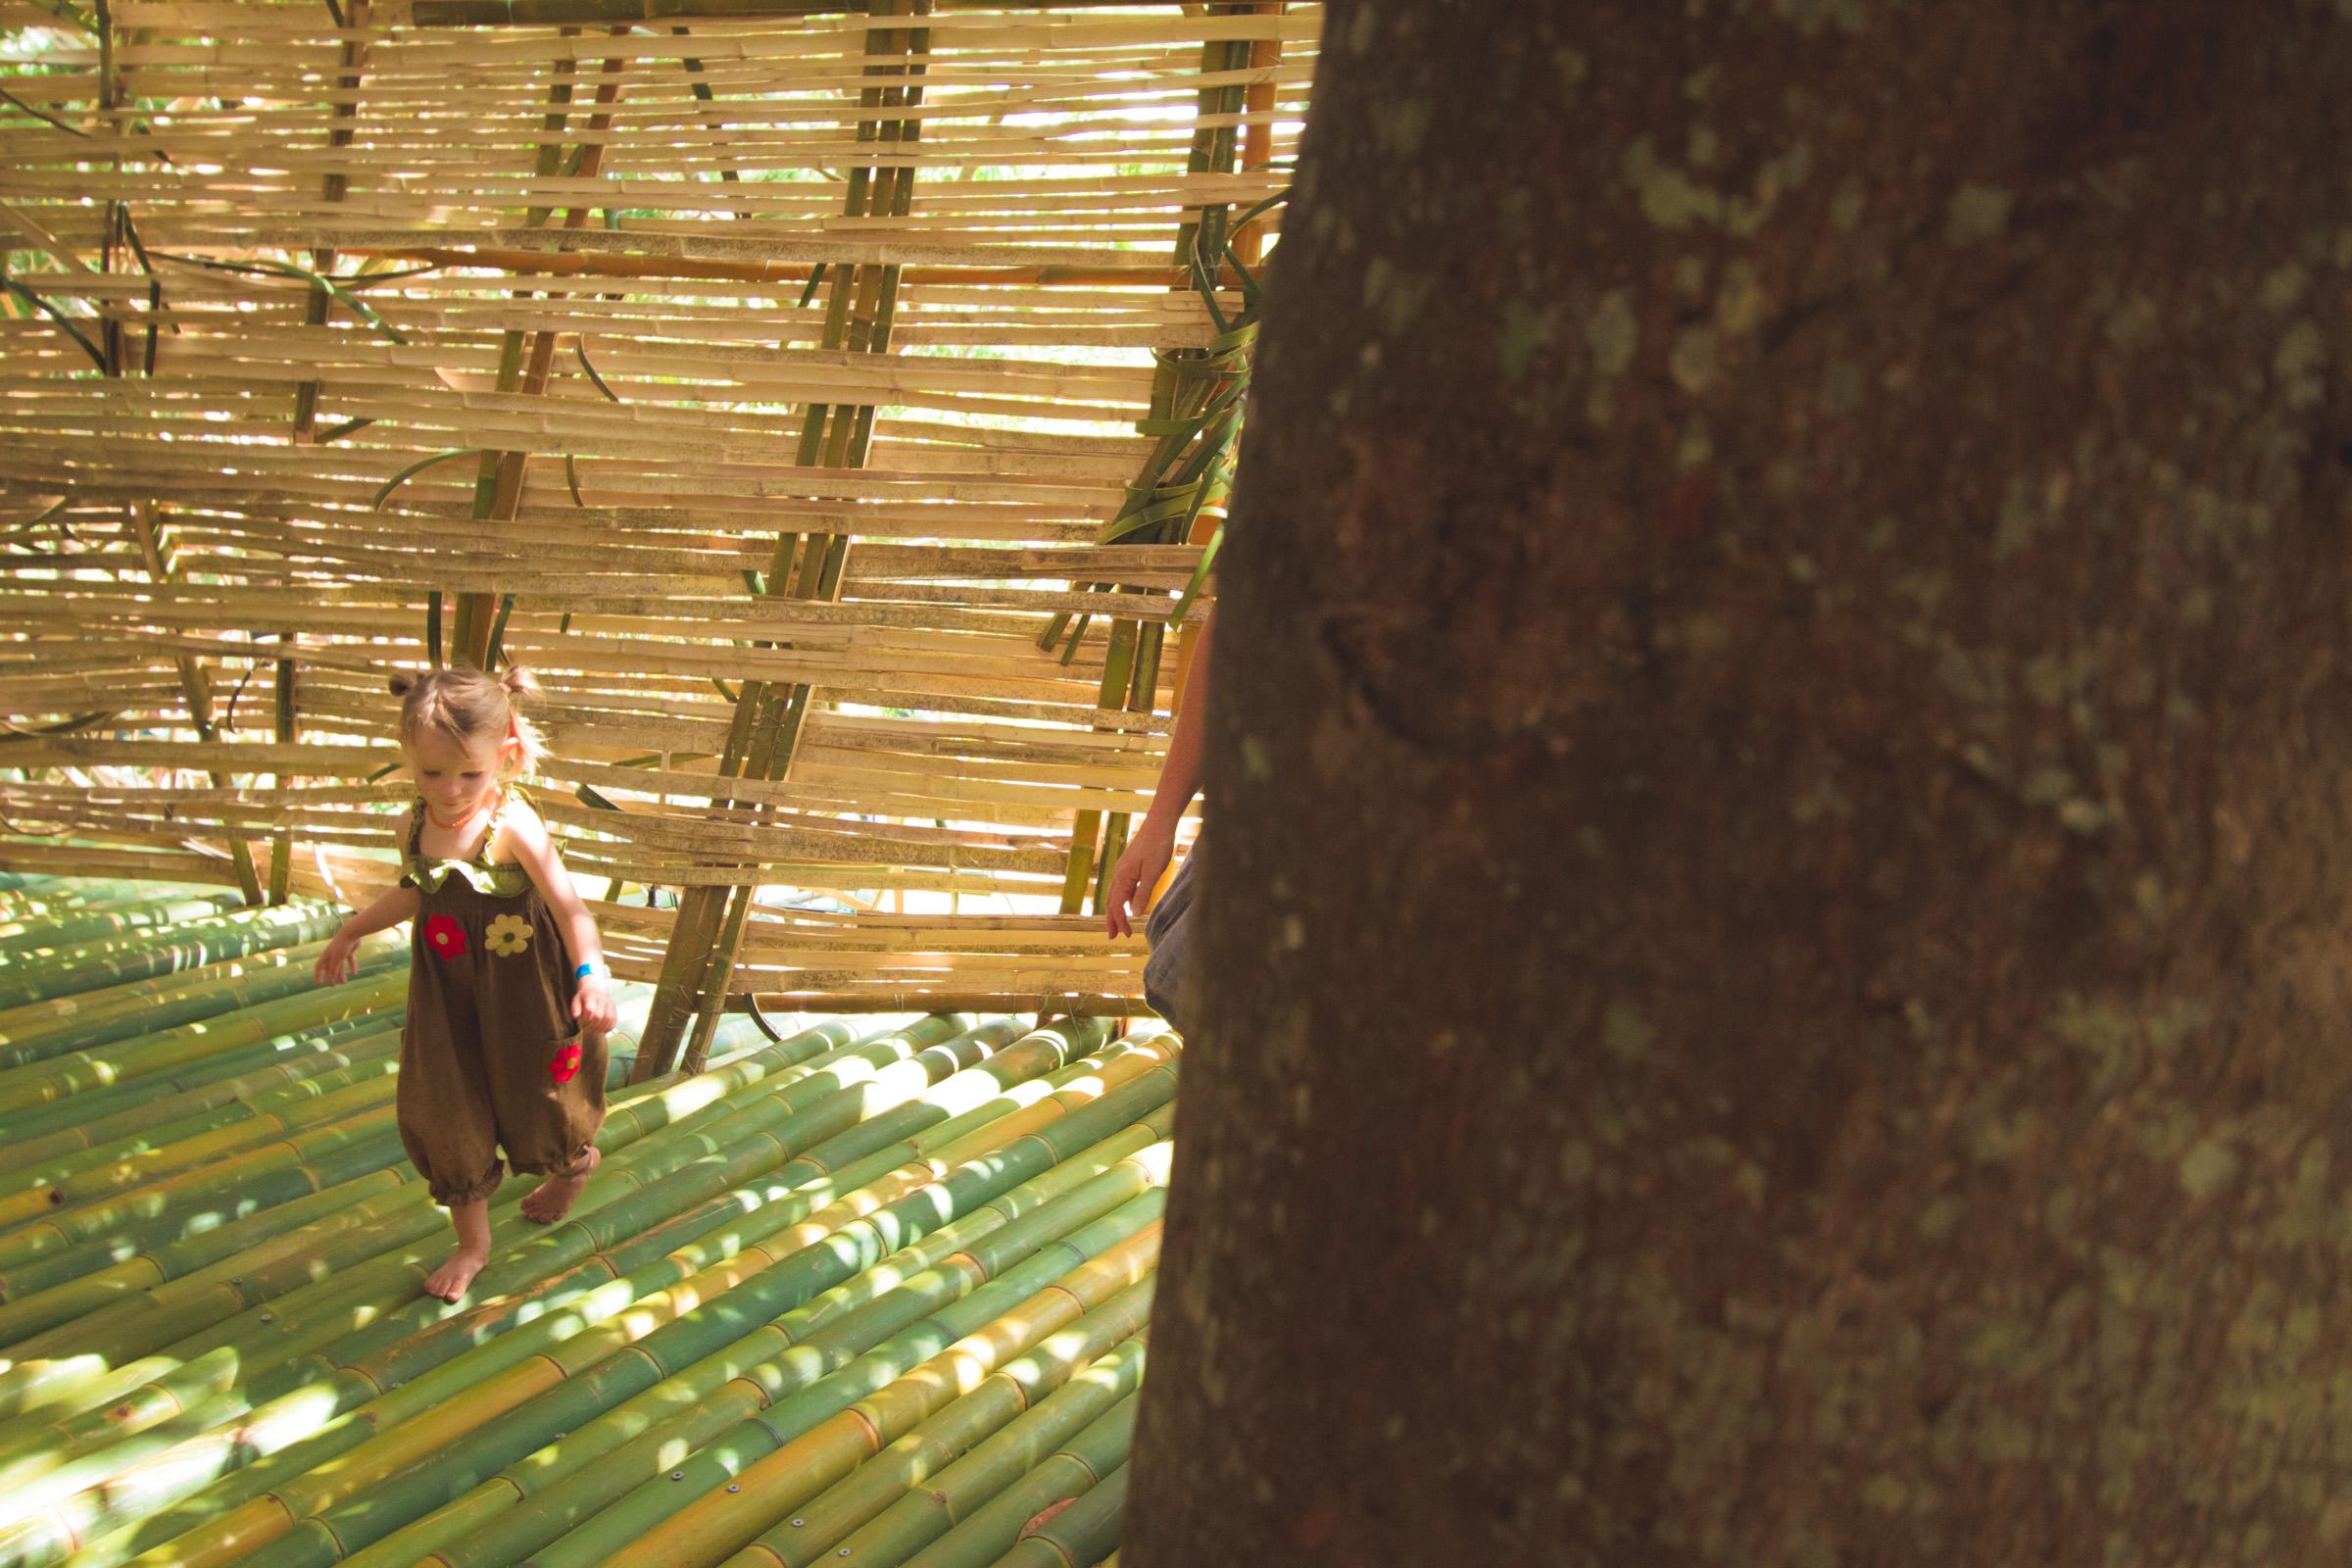 Tree house photography by Mercurio Alvarado  (118 of 132).jpg